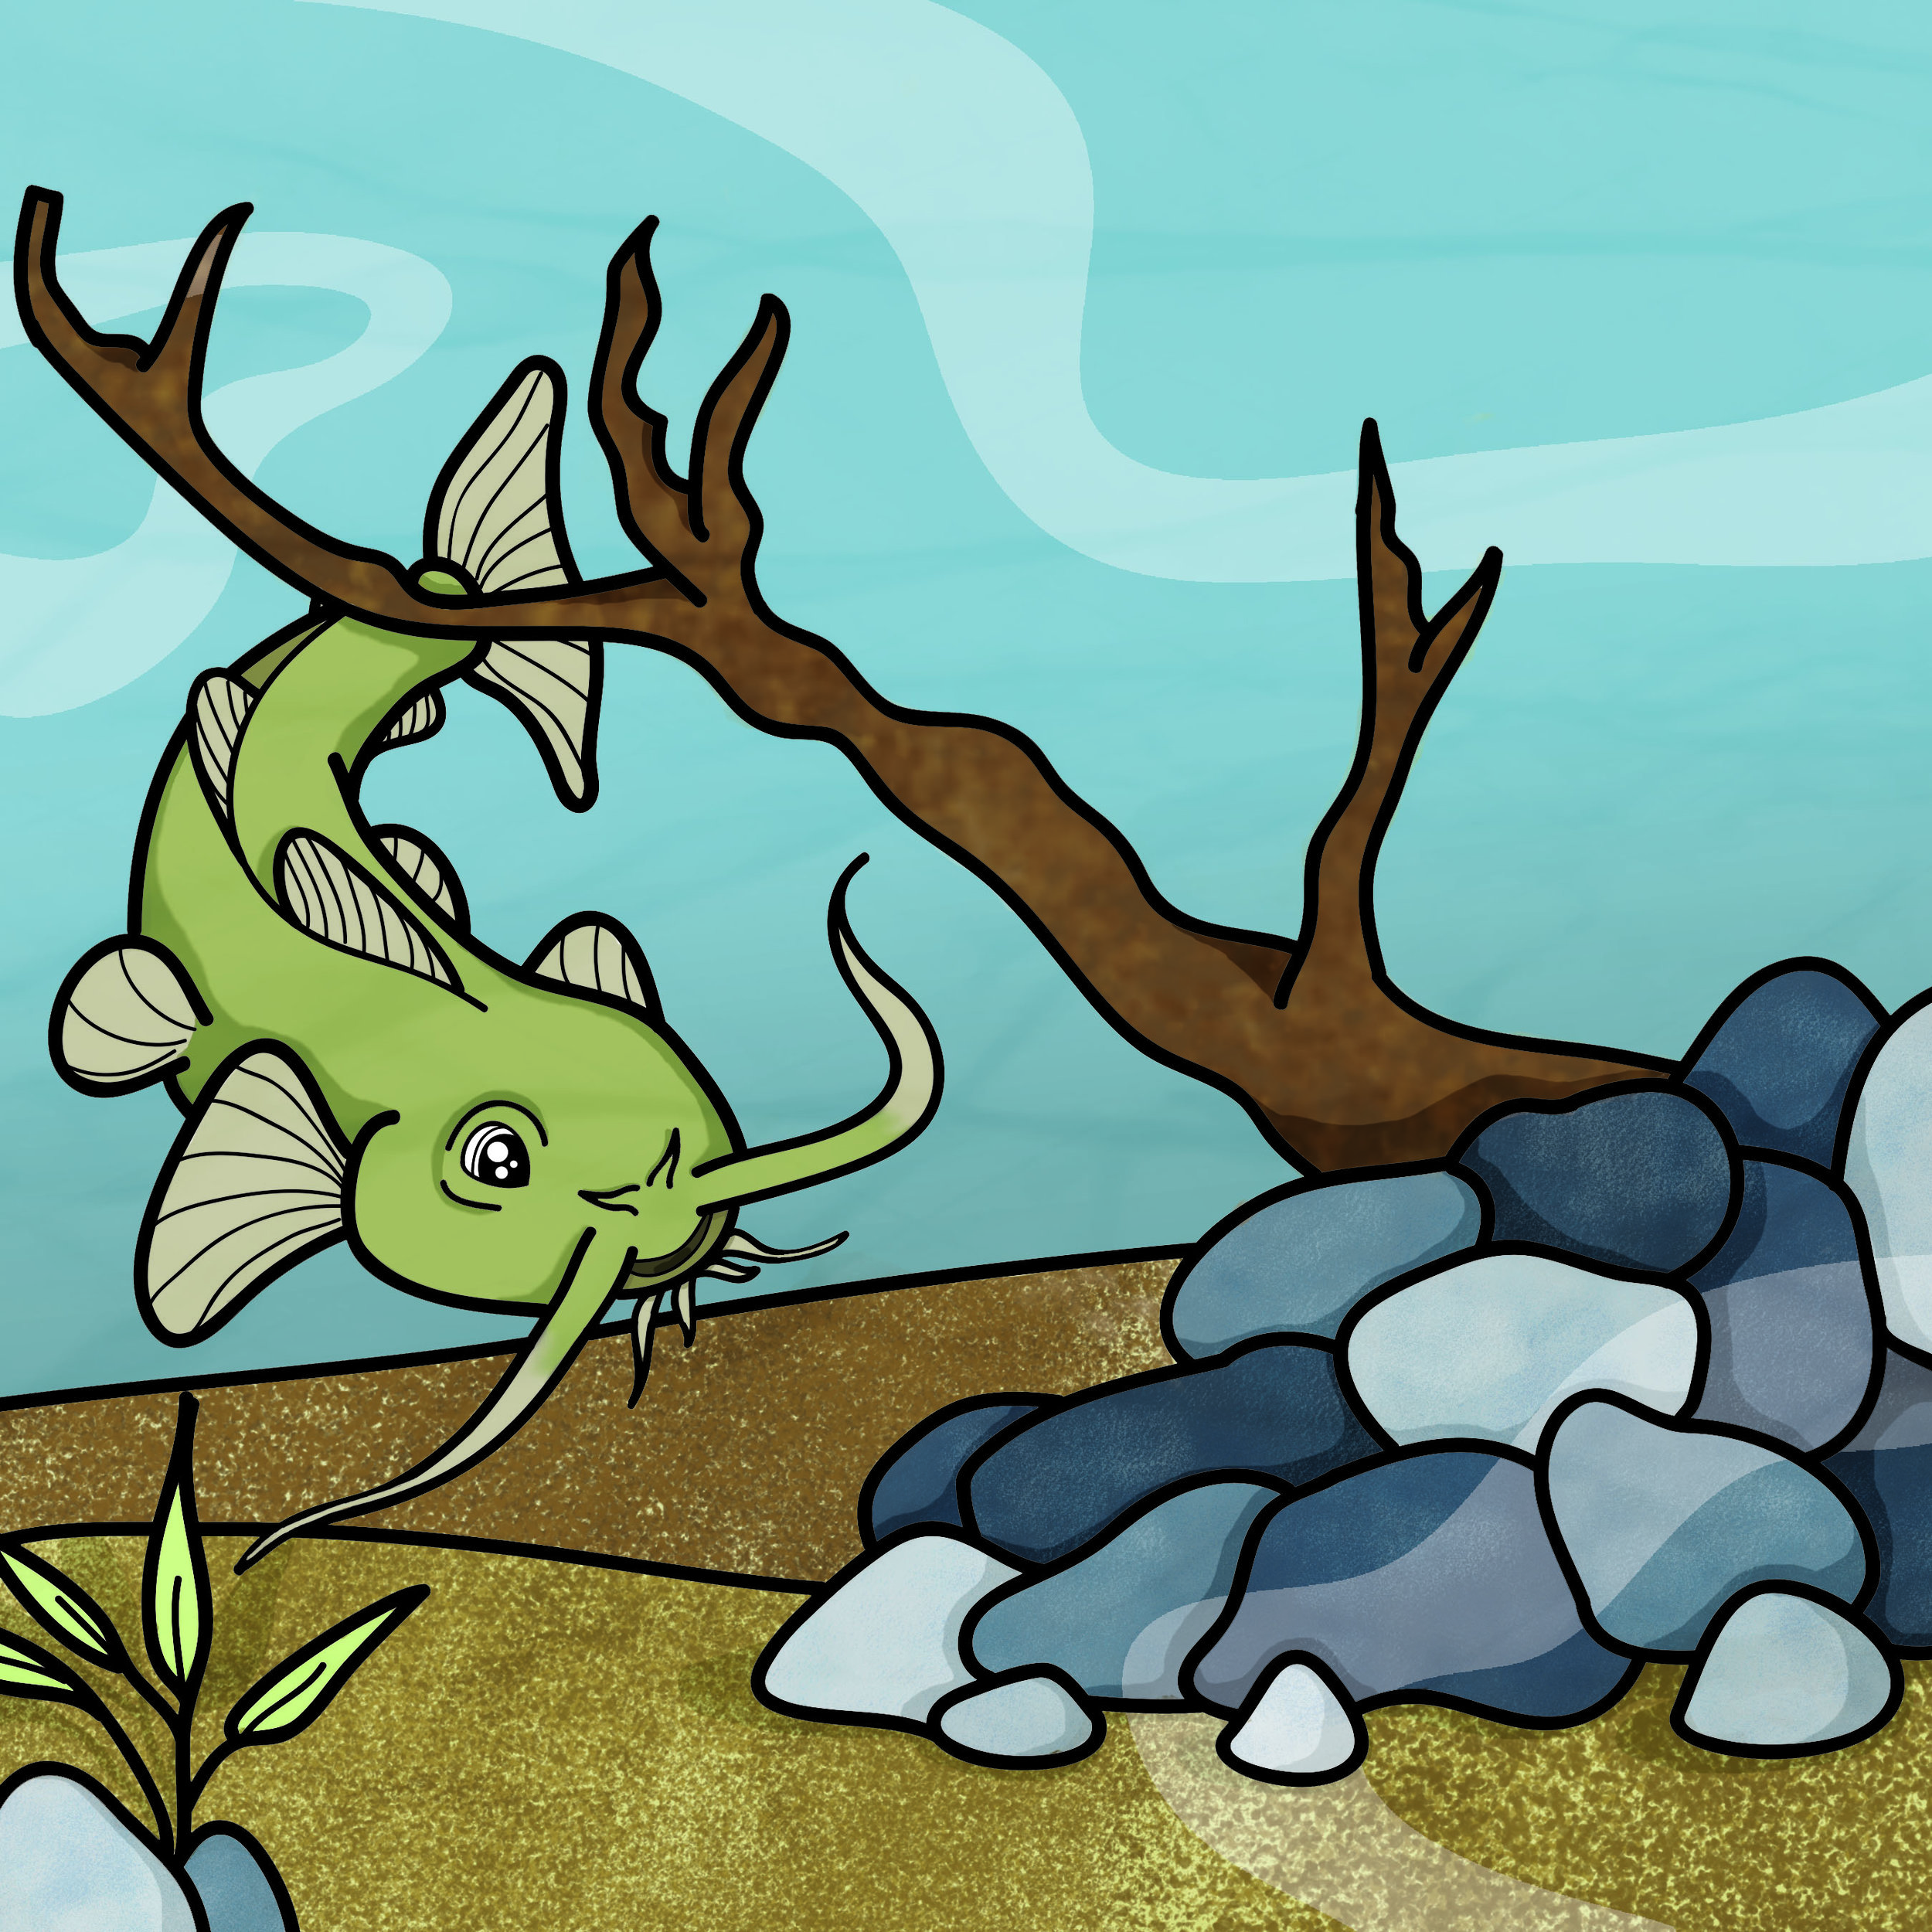 catfish page.jpg